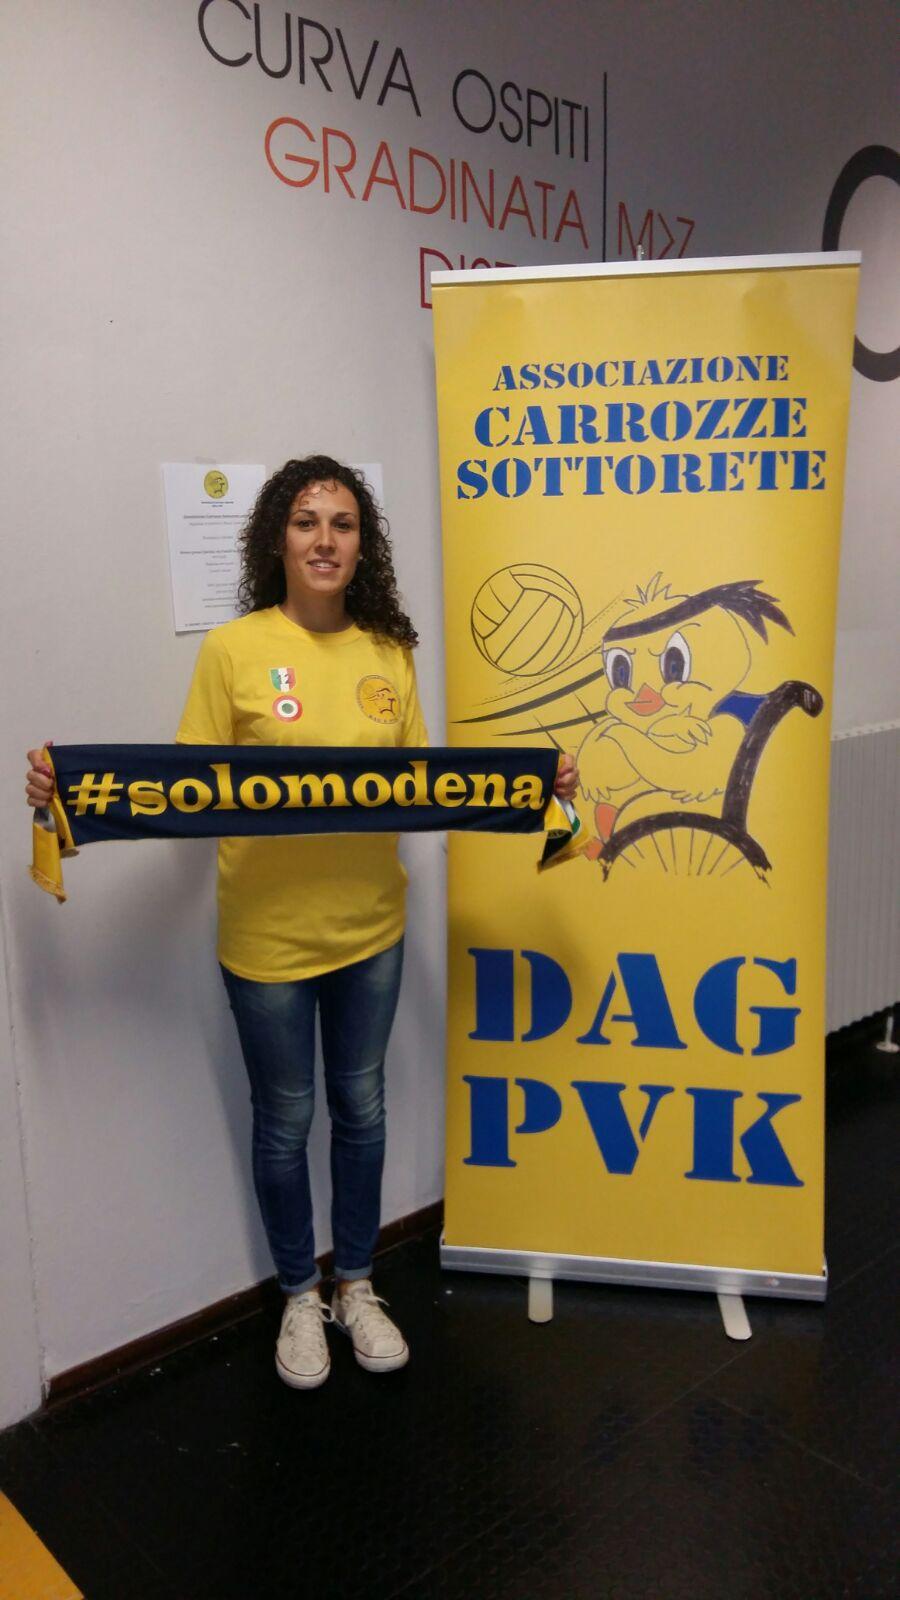 Linea Carrozze Sottorete 2016/17